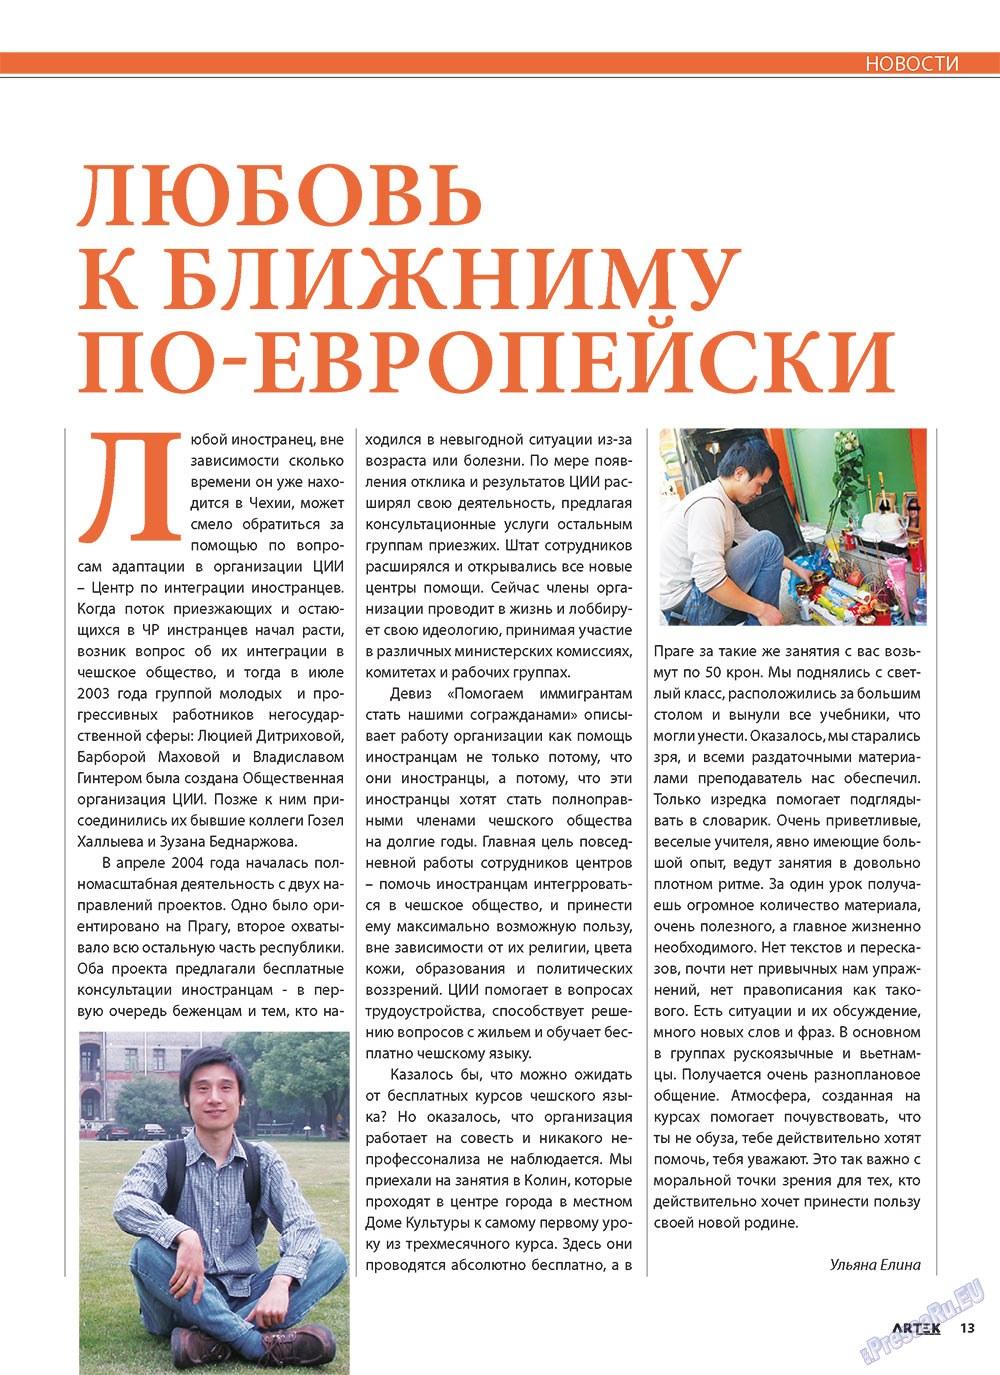 Артек (журнал). 2010 год, номер 6, стр. 15